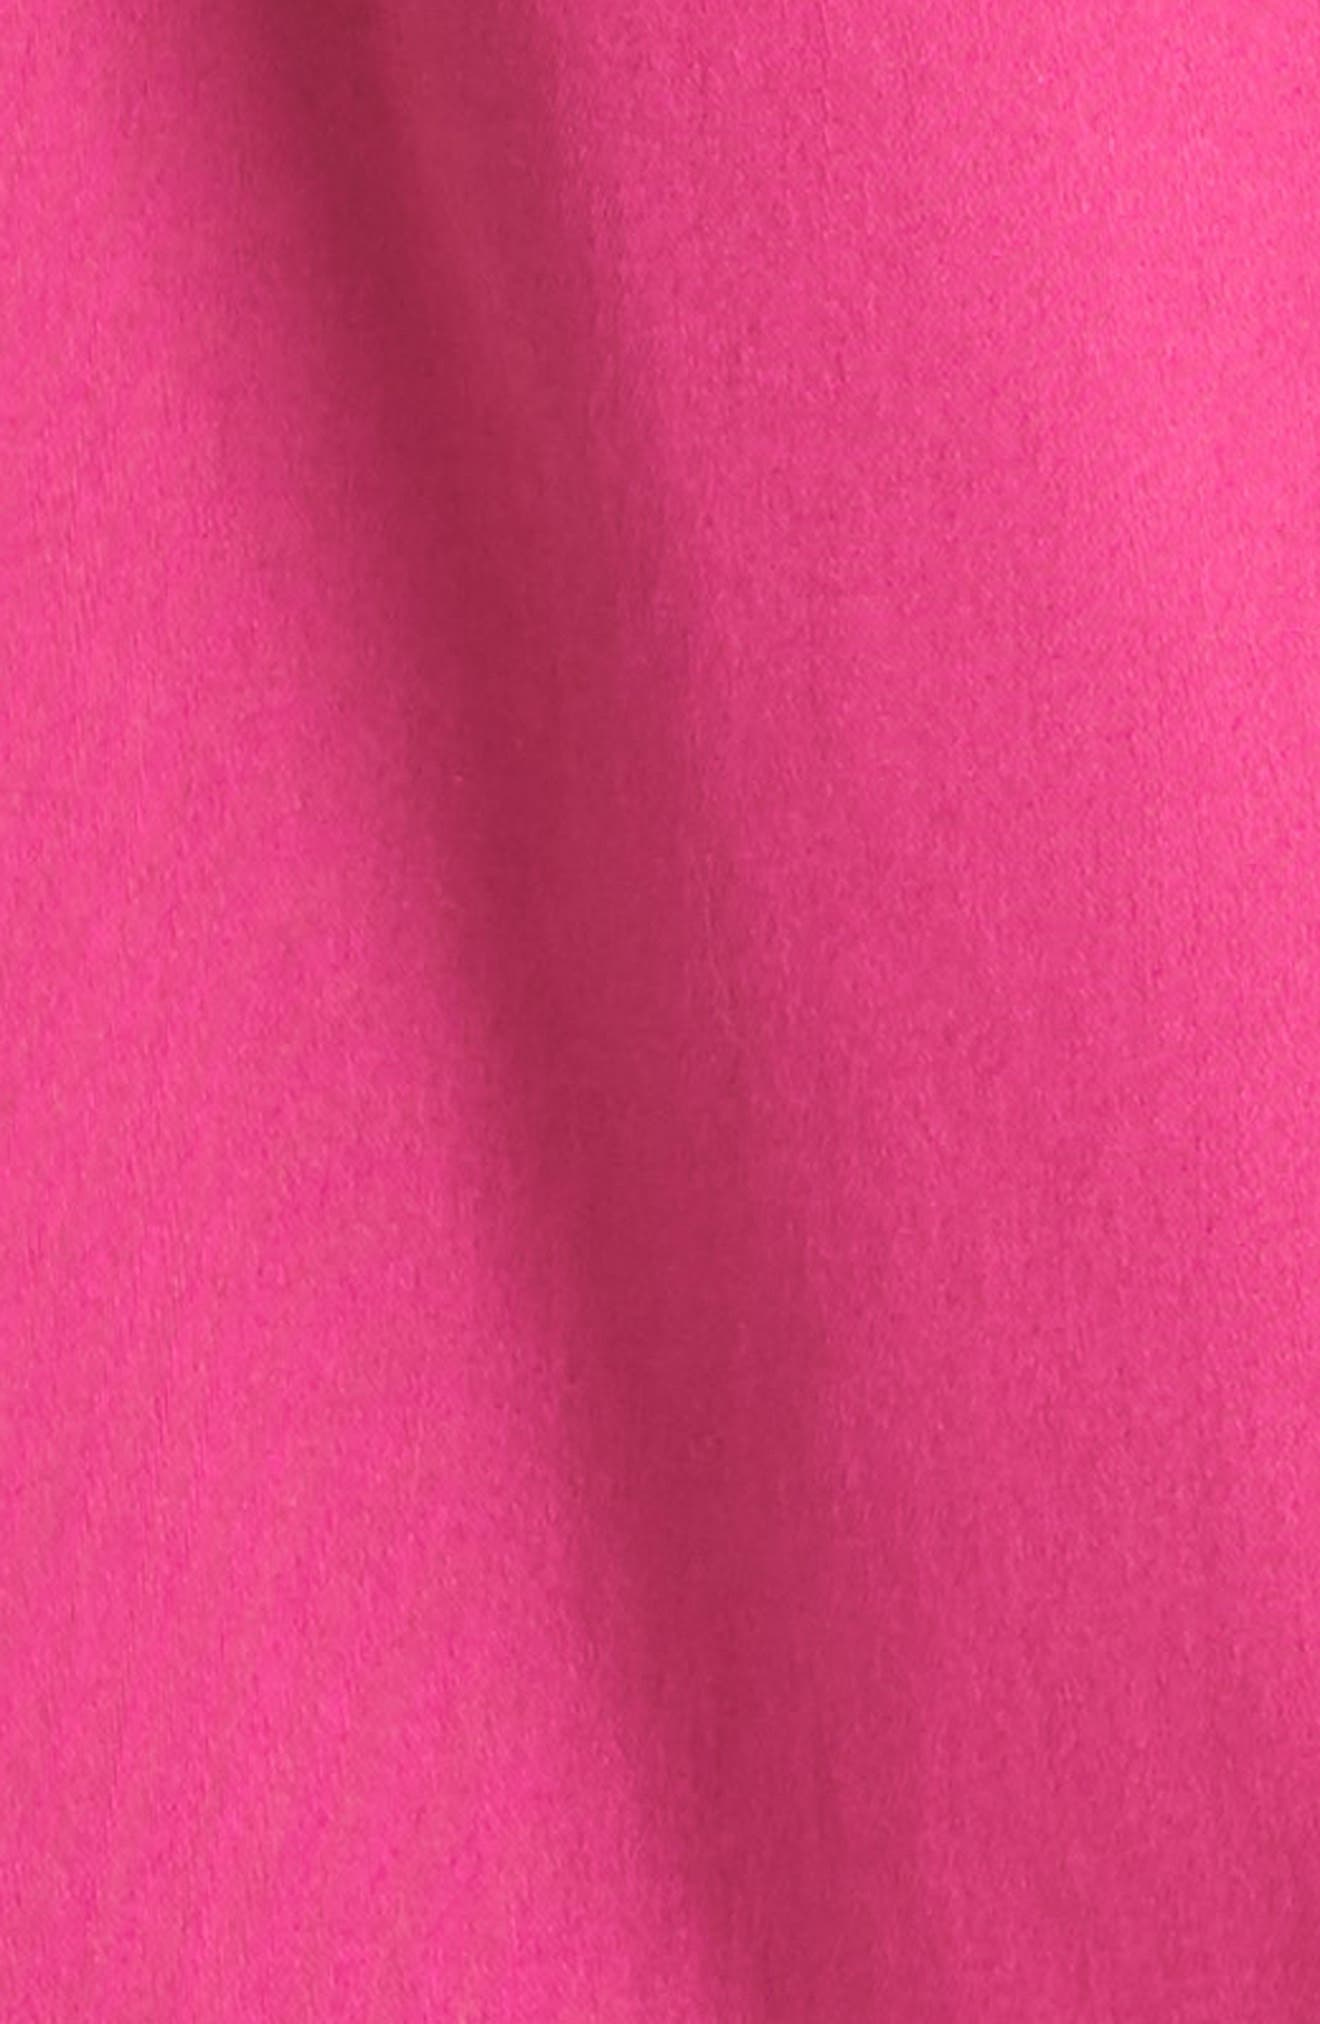 Daynaa Bow Shoulder Top,                             Alternate thumbnail 5, color,                             Fuchsia